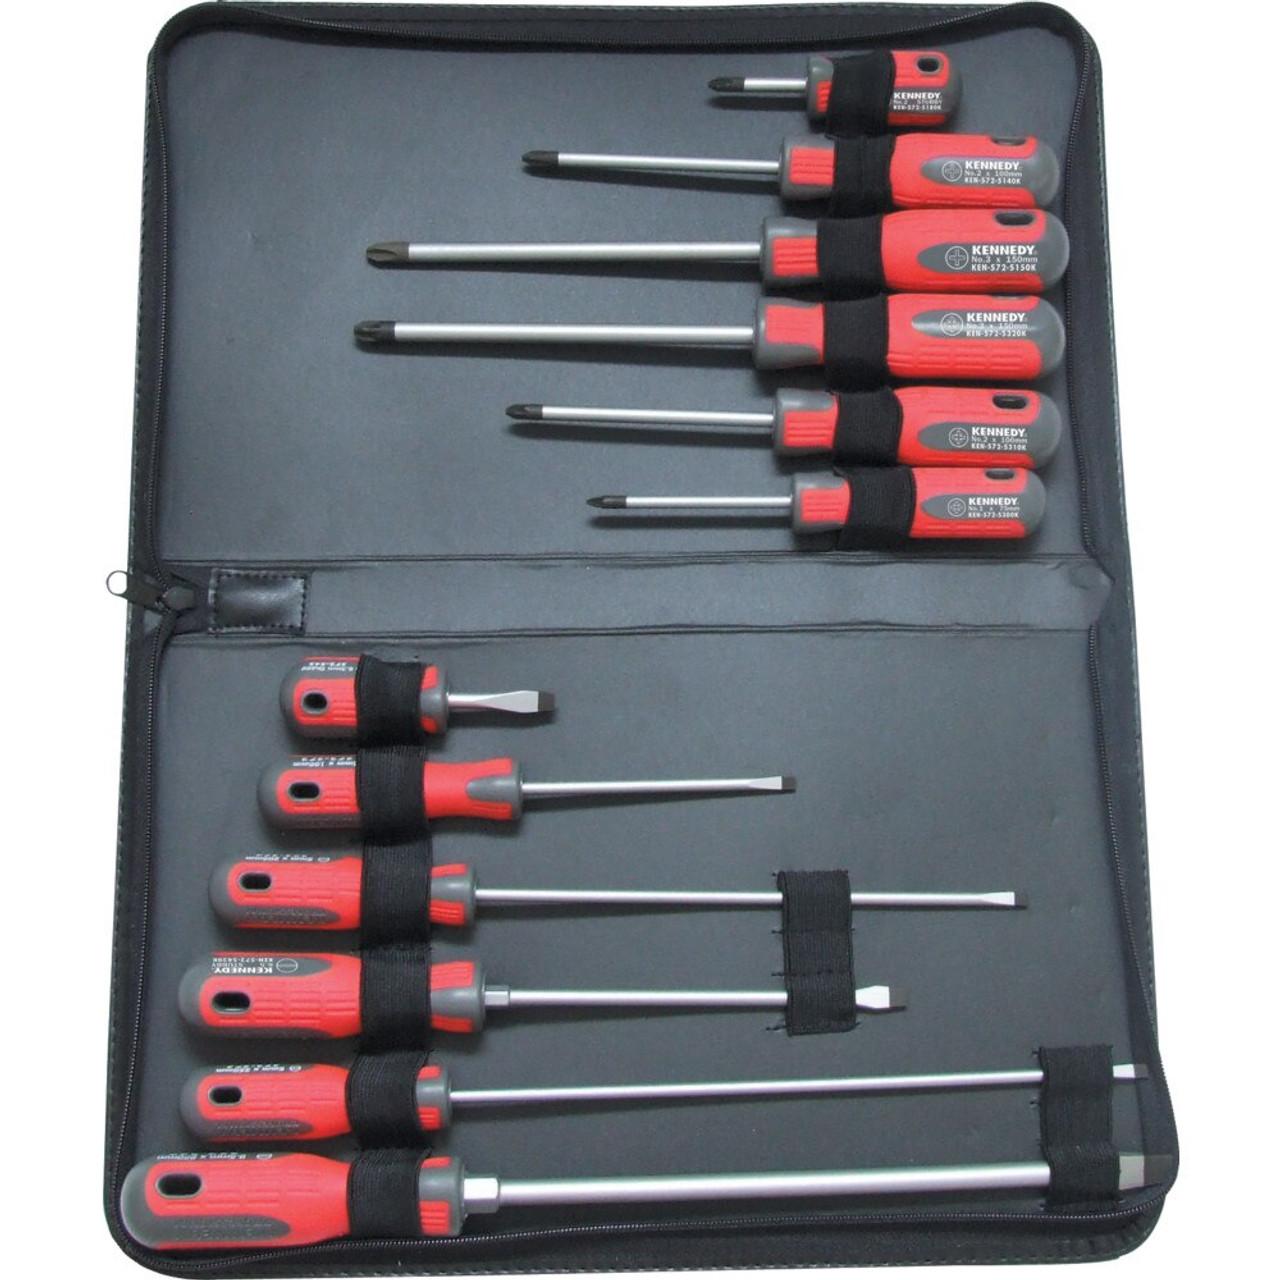 Kennedy-Pro Torx Pro-Torq Precision Screwdriver Set 6-Pce